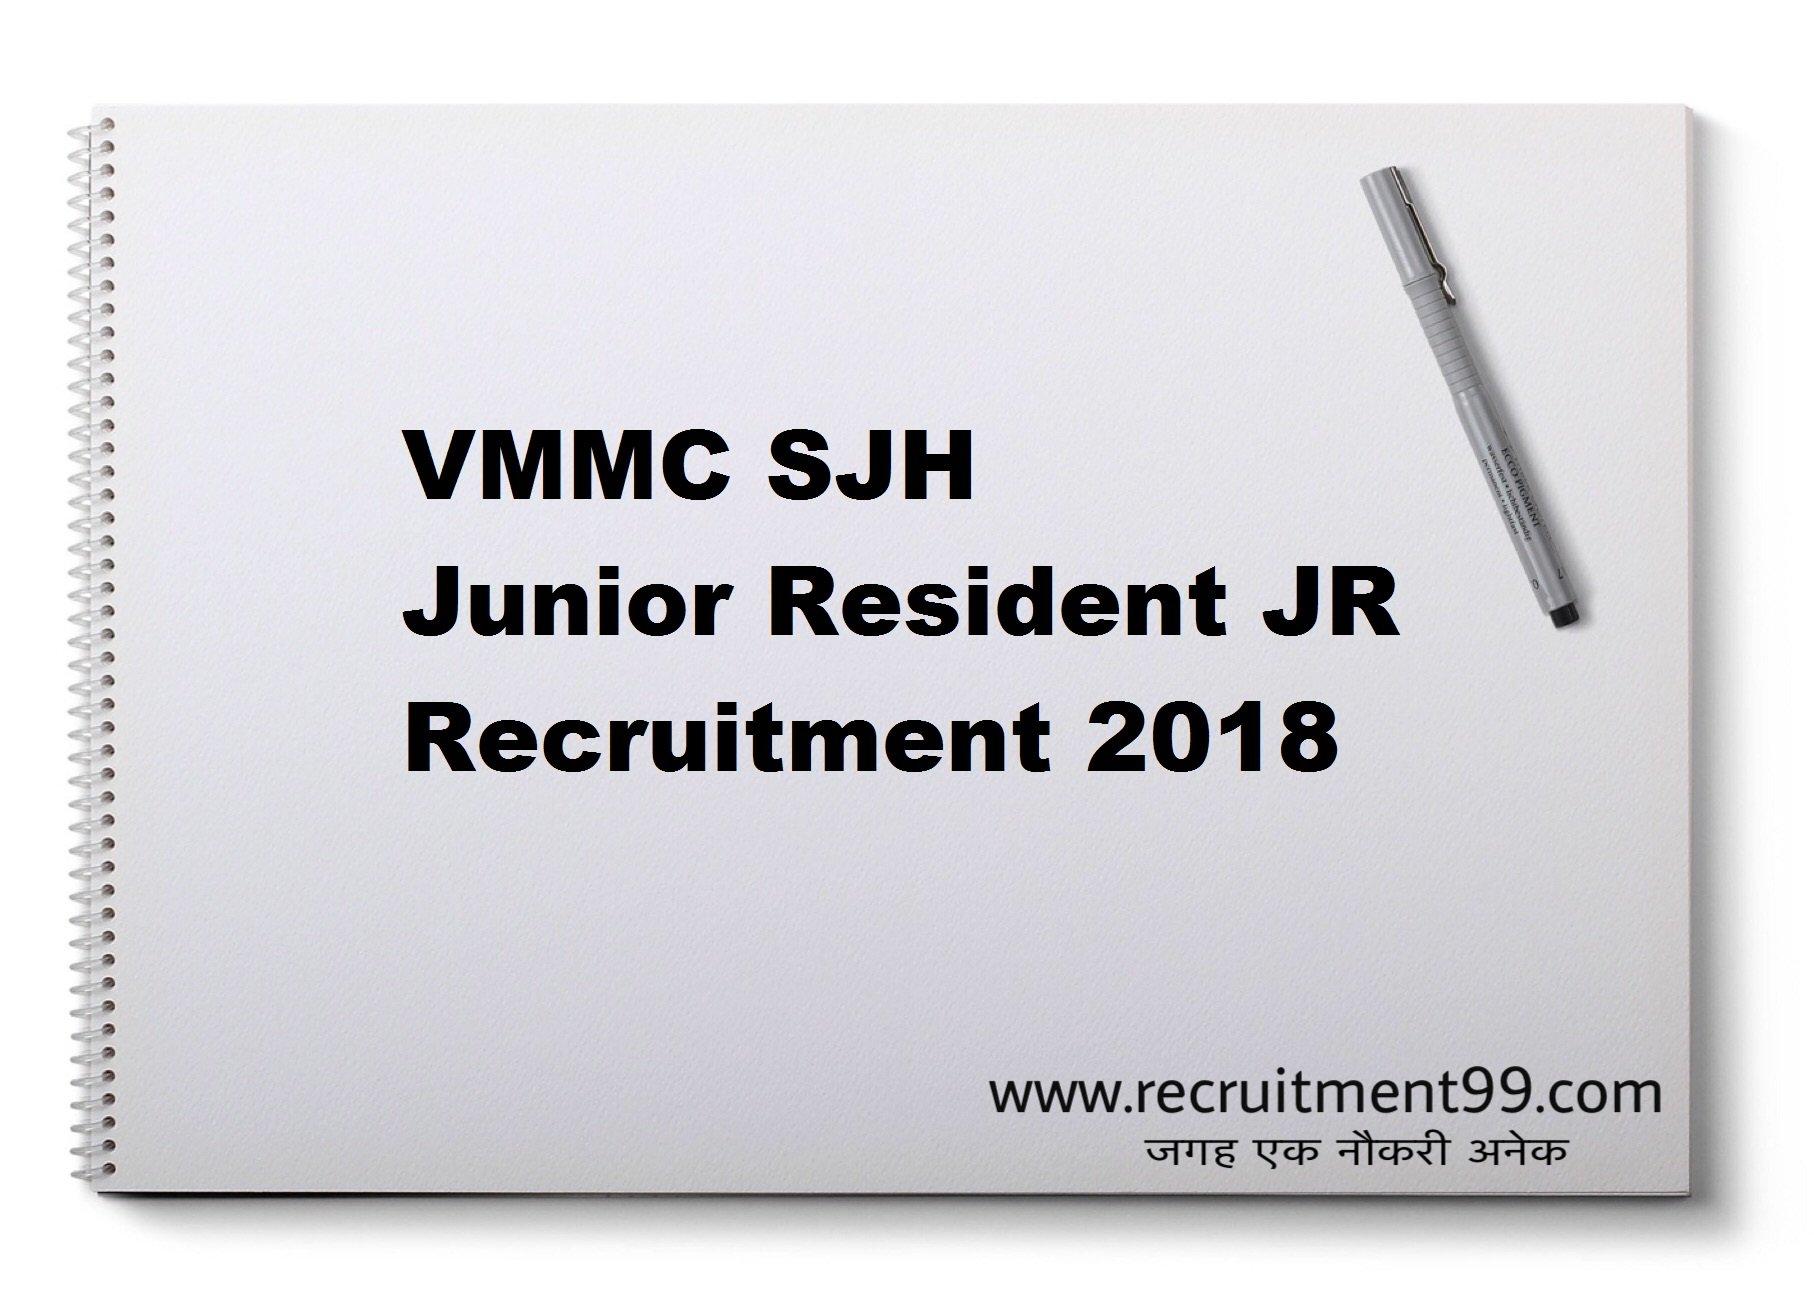 VMMC SJH Junior Resident Recruitment Admit Card Result 2018